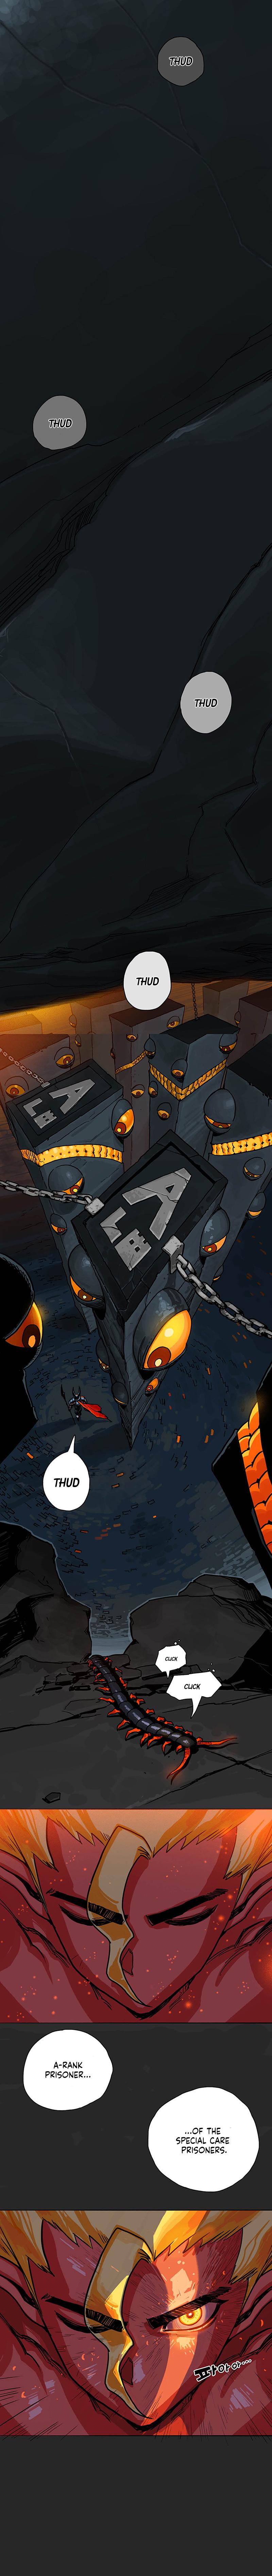 https://img2.nineanime.com/comics/pic4/43/39531/1671790/0f46fe677ed856f99805fd8ec9236575.jpg Page 1